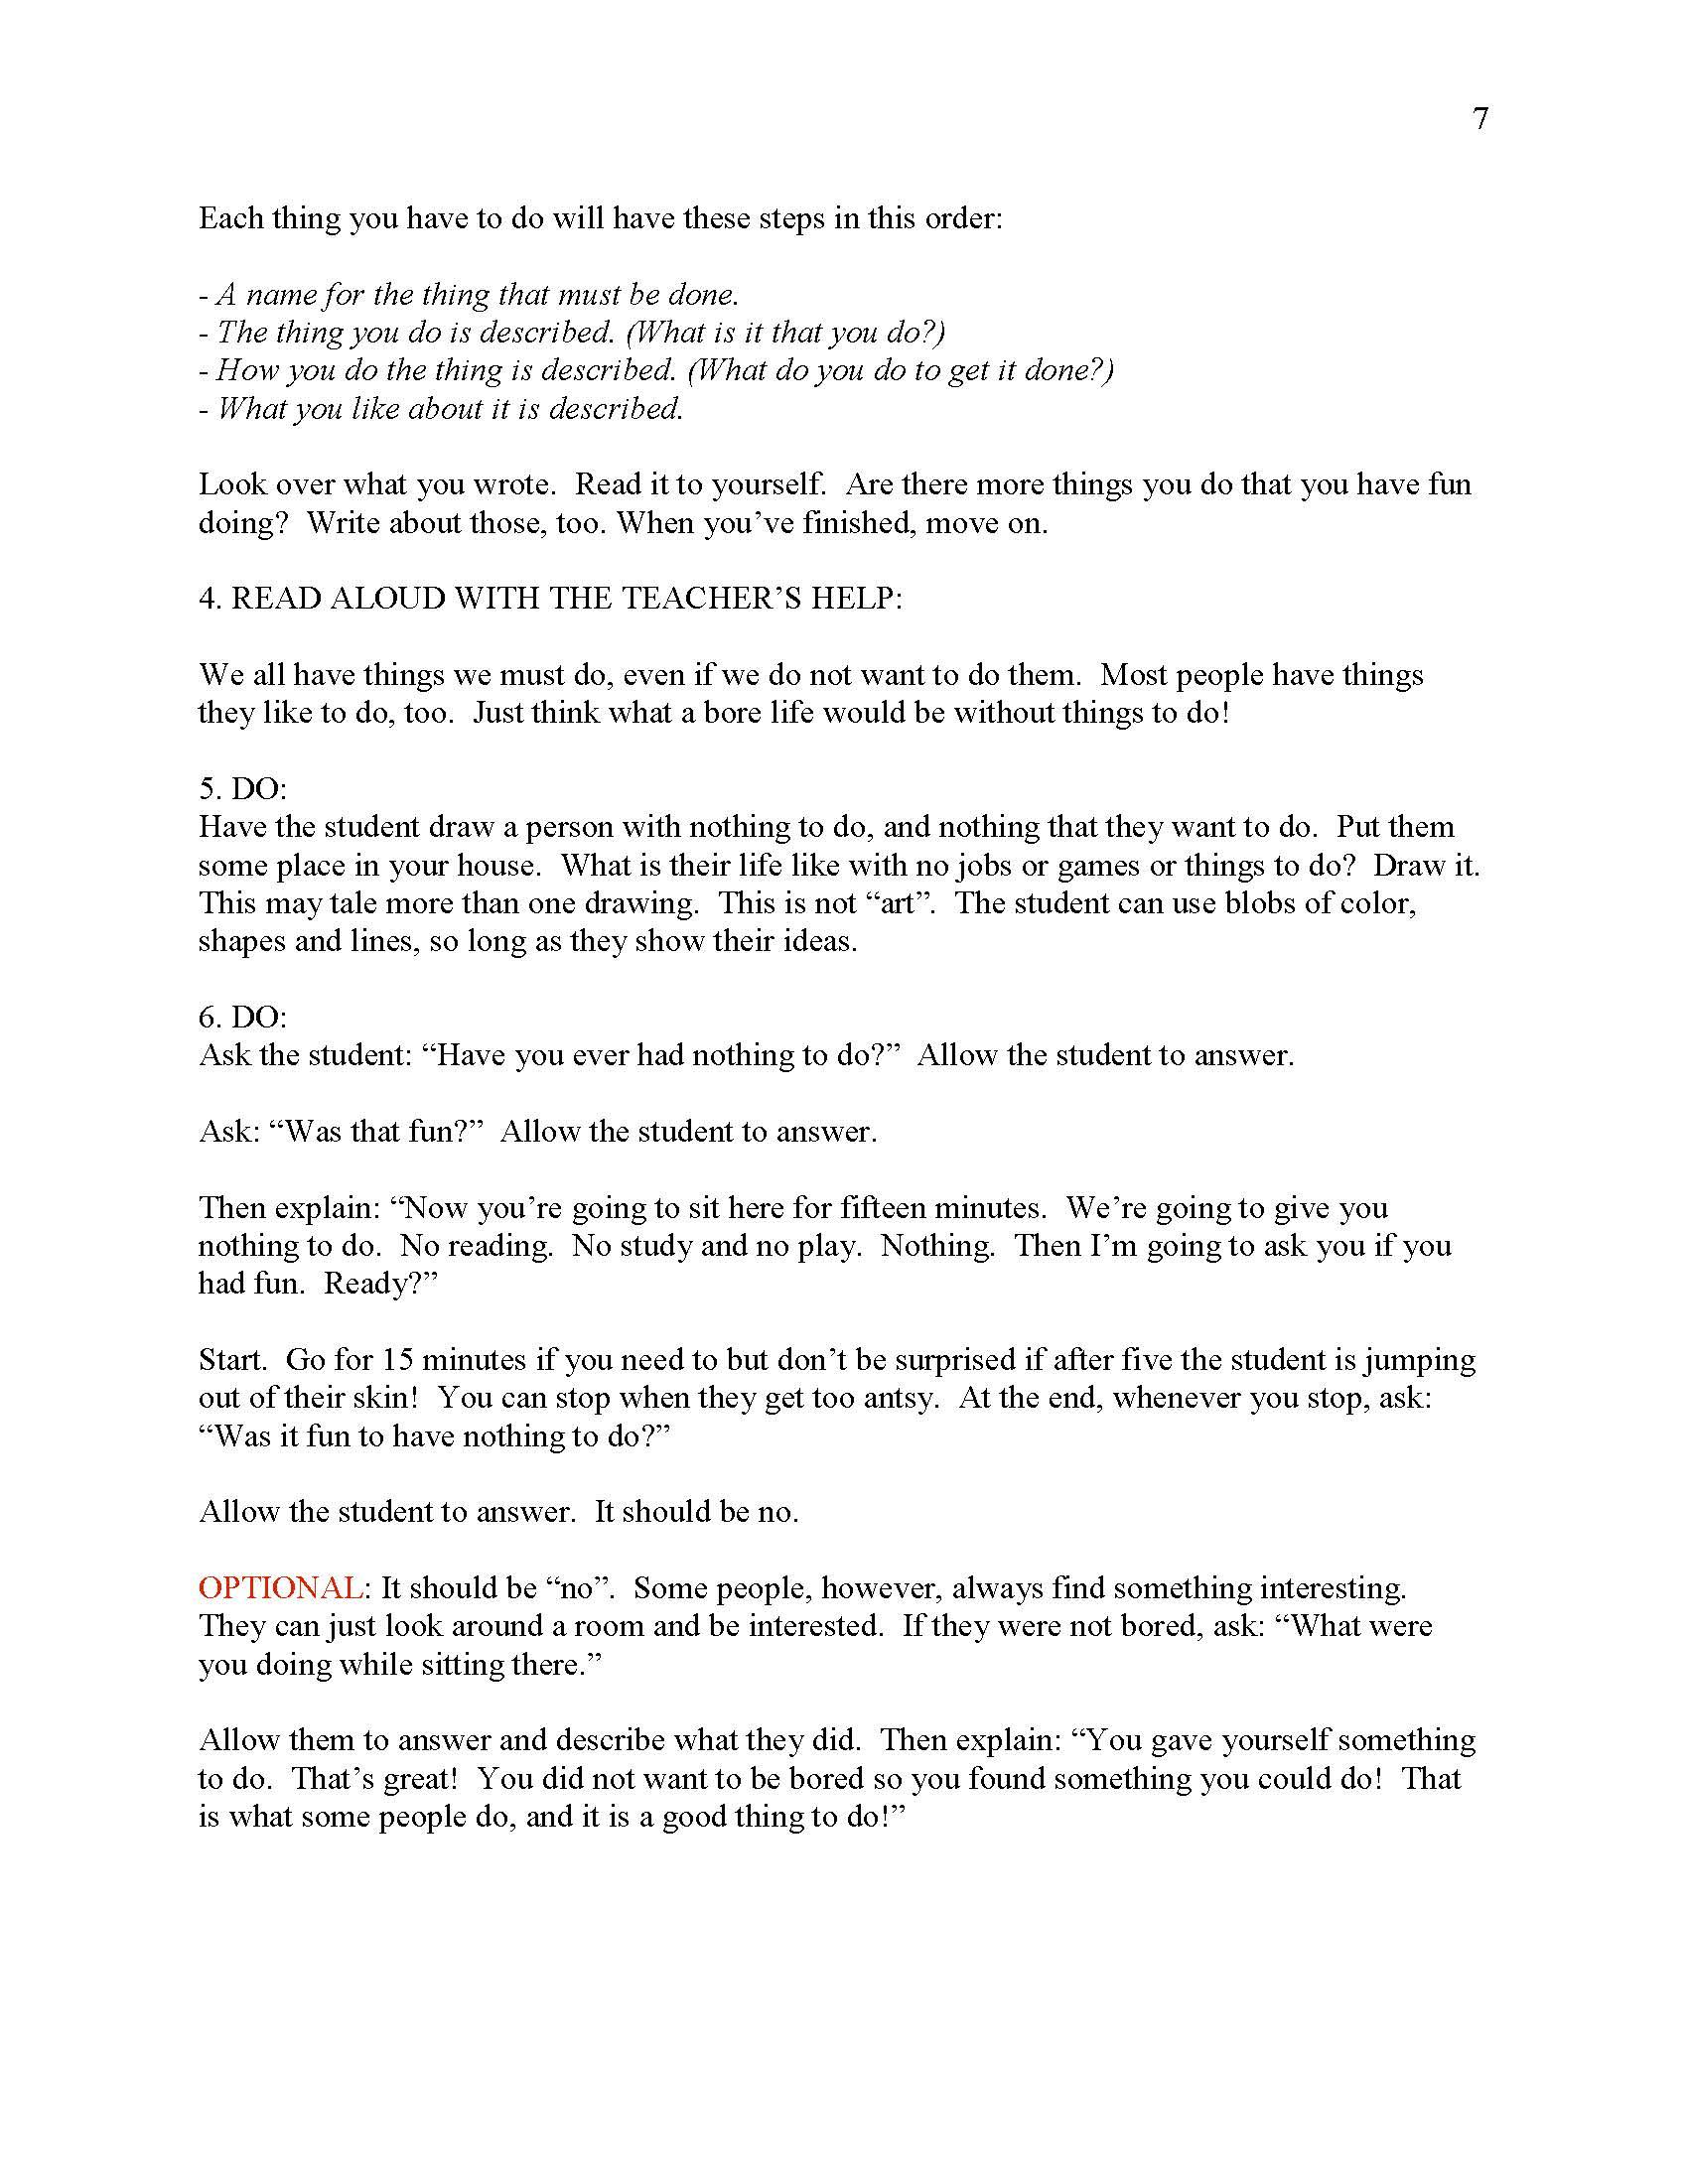 Step 1 Study & Life Skills 5 - Making Plans_Page_08.jpg